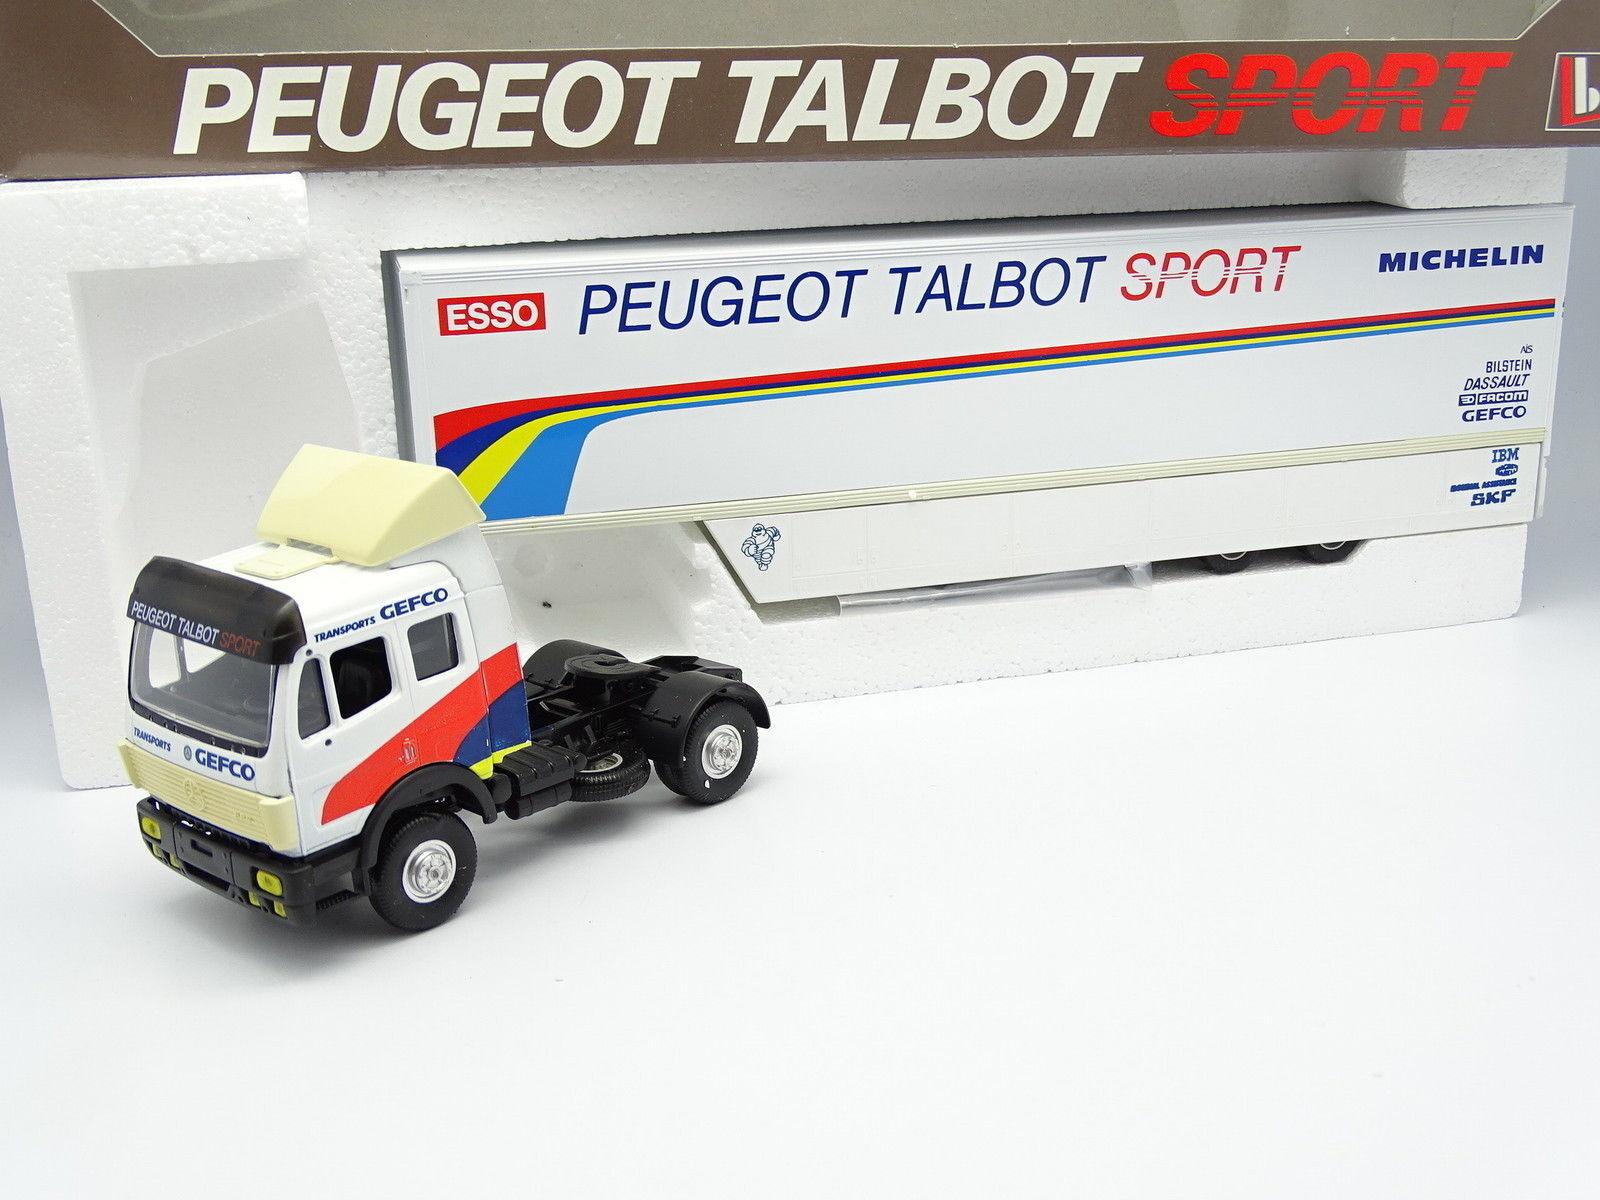 Eligor lbs 1   43 - mercedes 1911 eps wohnmobil peugeot - talbot sport 905 in le mans